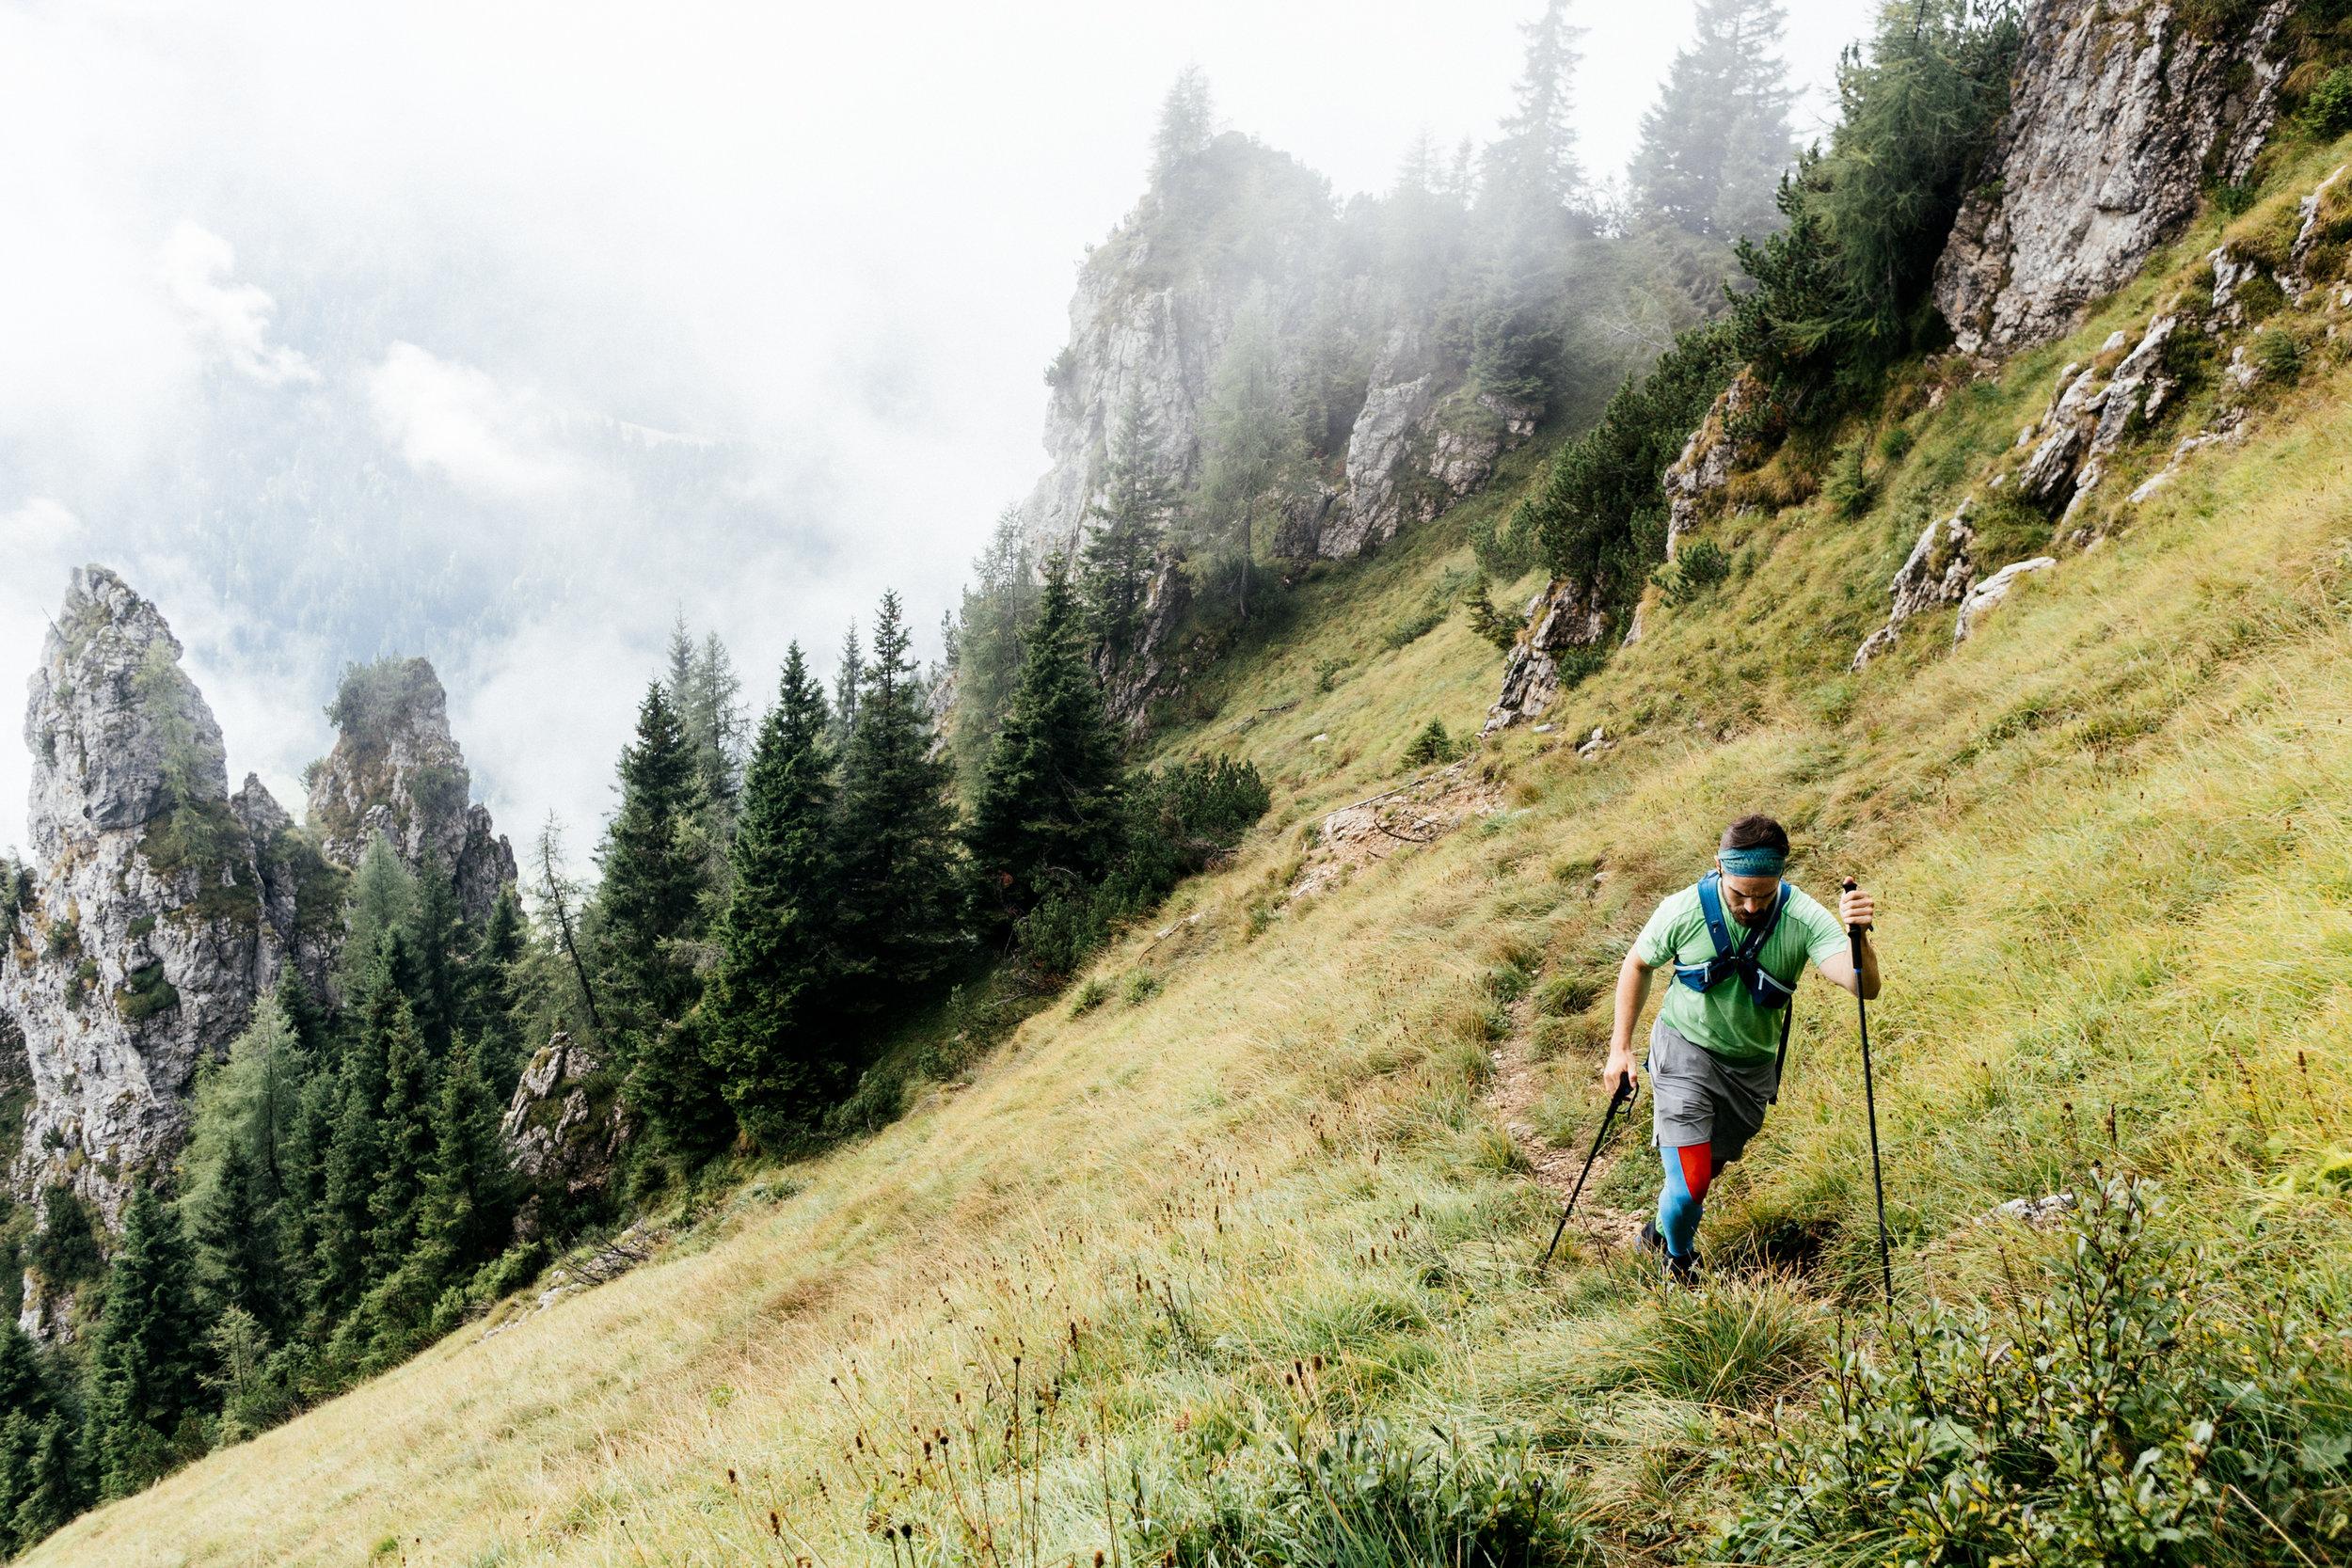 Dolomites-ChrisBrinleeJr-SEP17-29.jpg